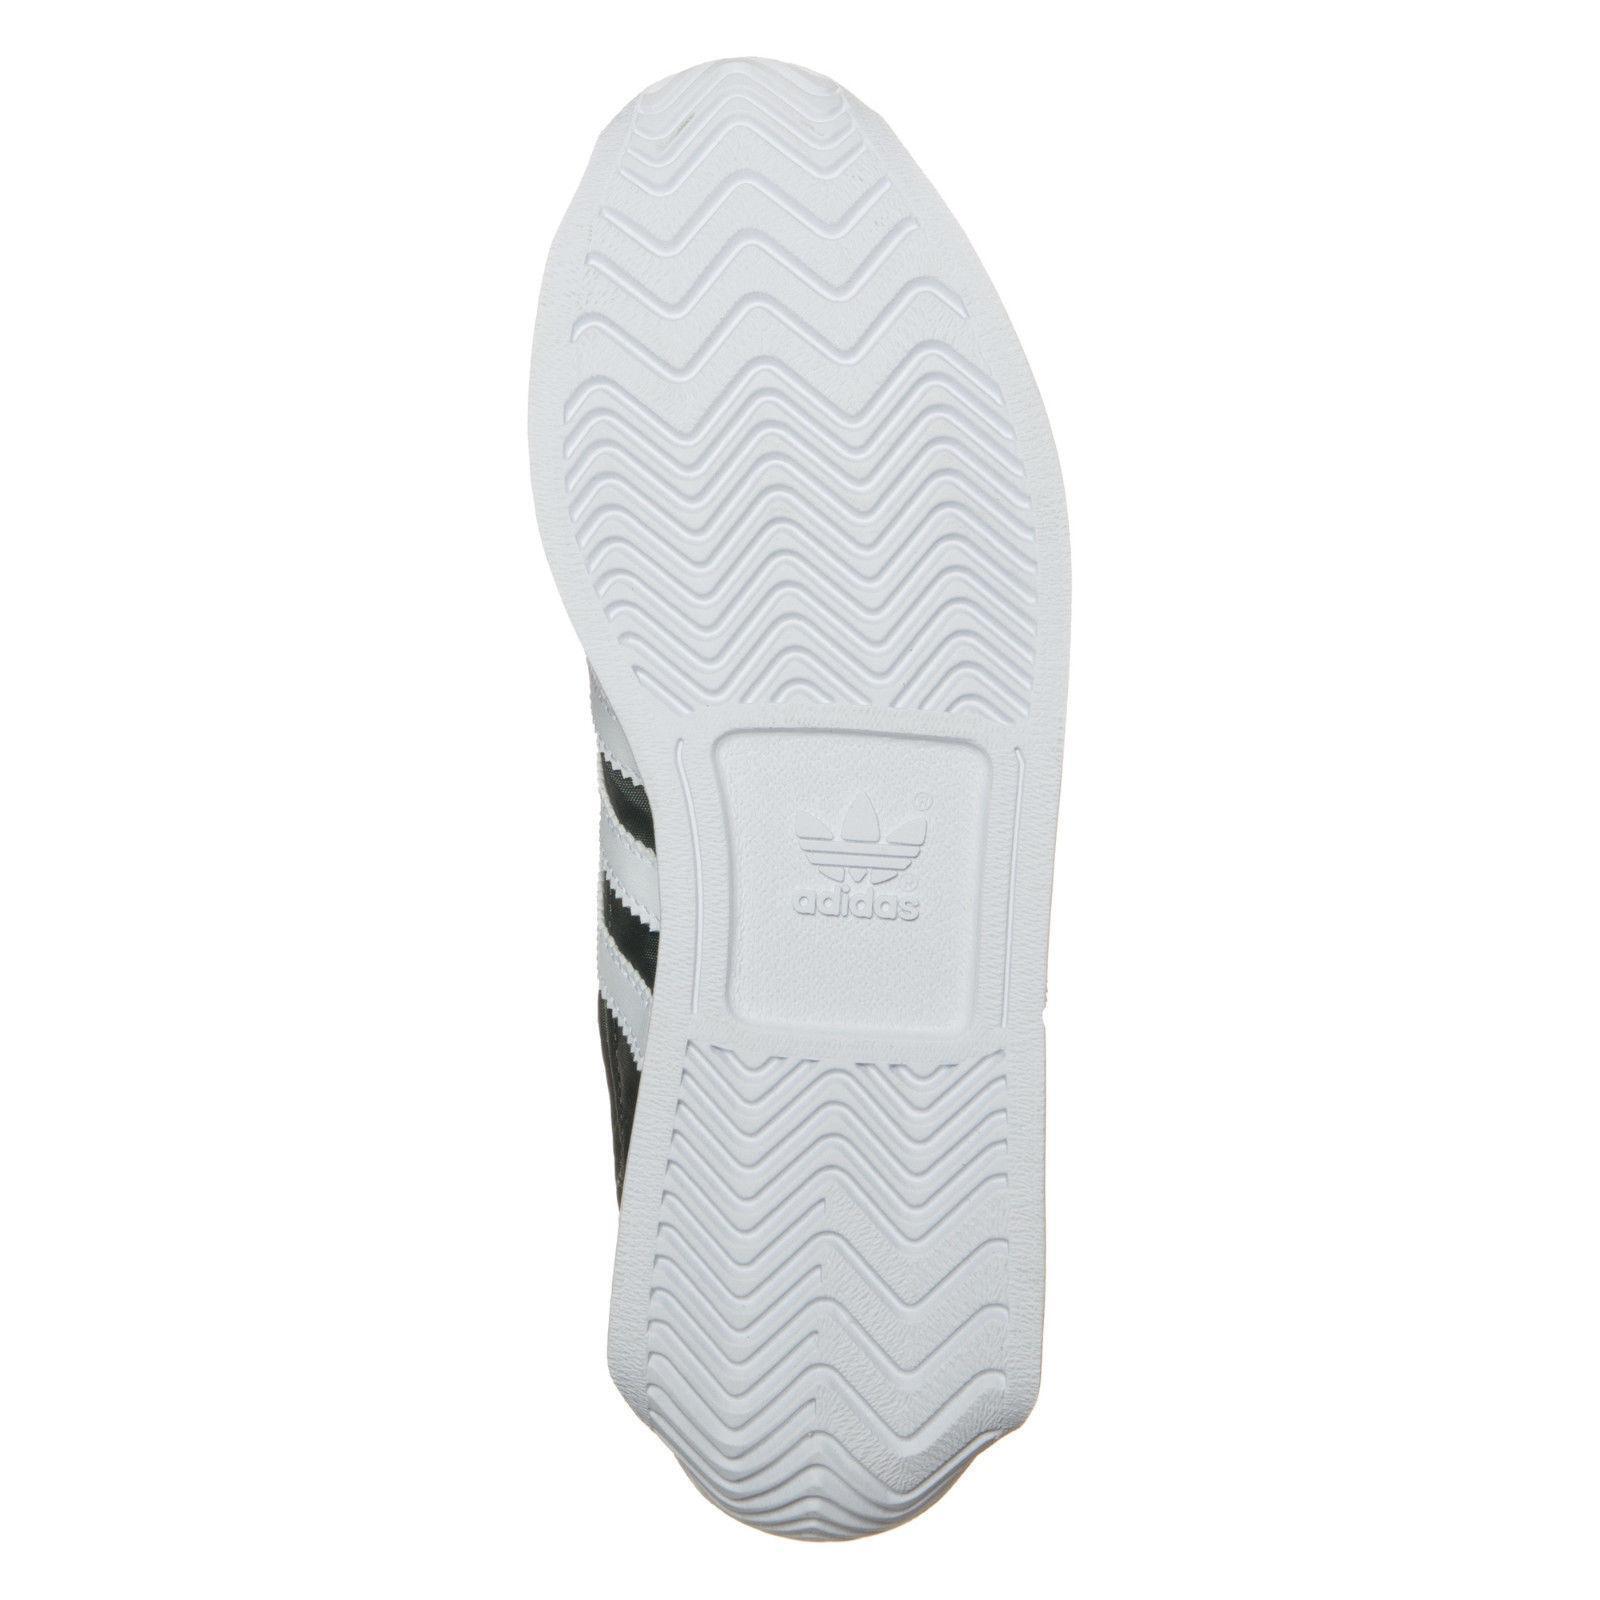 Donne adidas paese og w w w utiivy   formatori s32201 camoscio bianco tessili | Non così costoso  97e12c